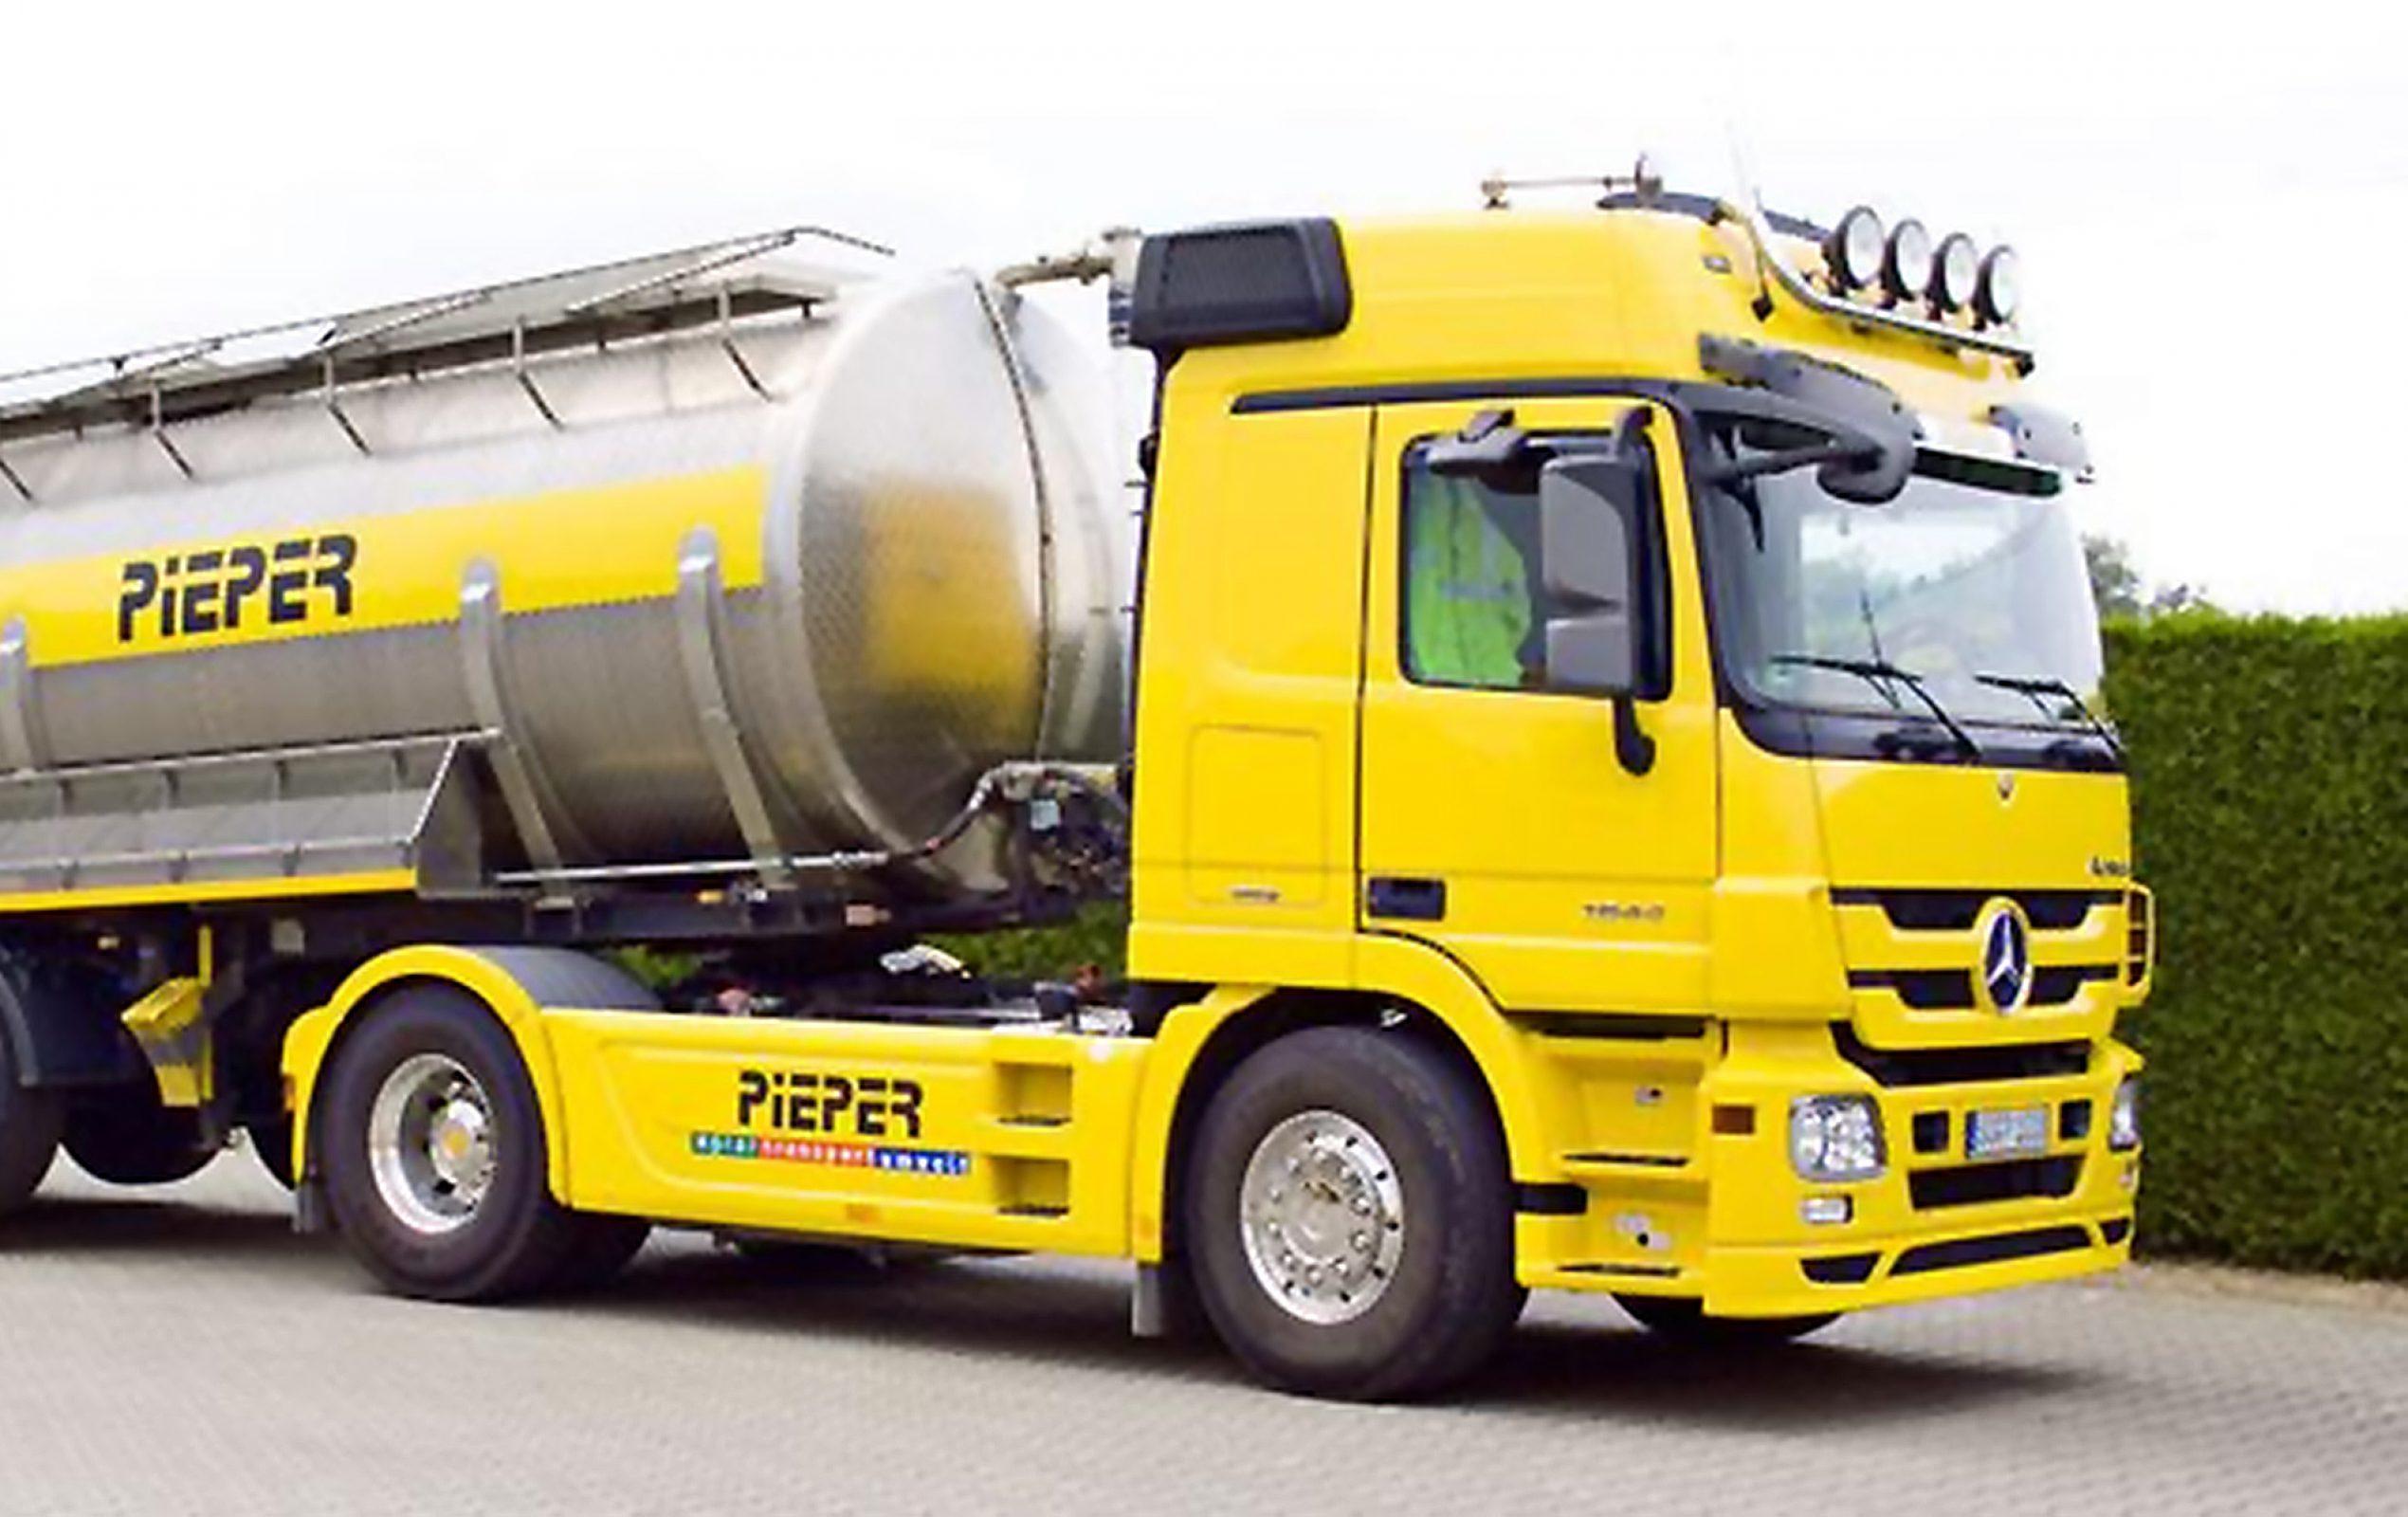 PIEPER GmbH & Co. KG